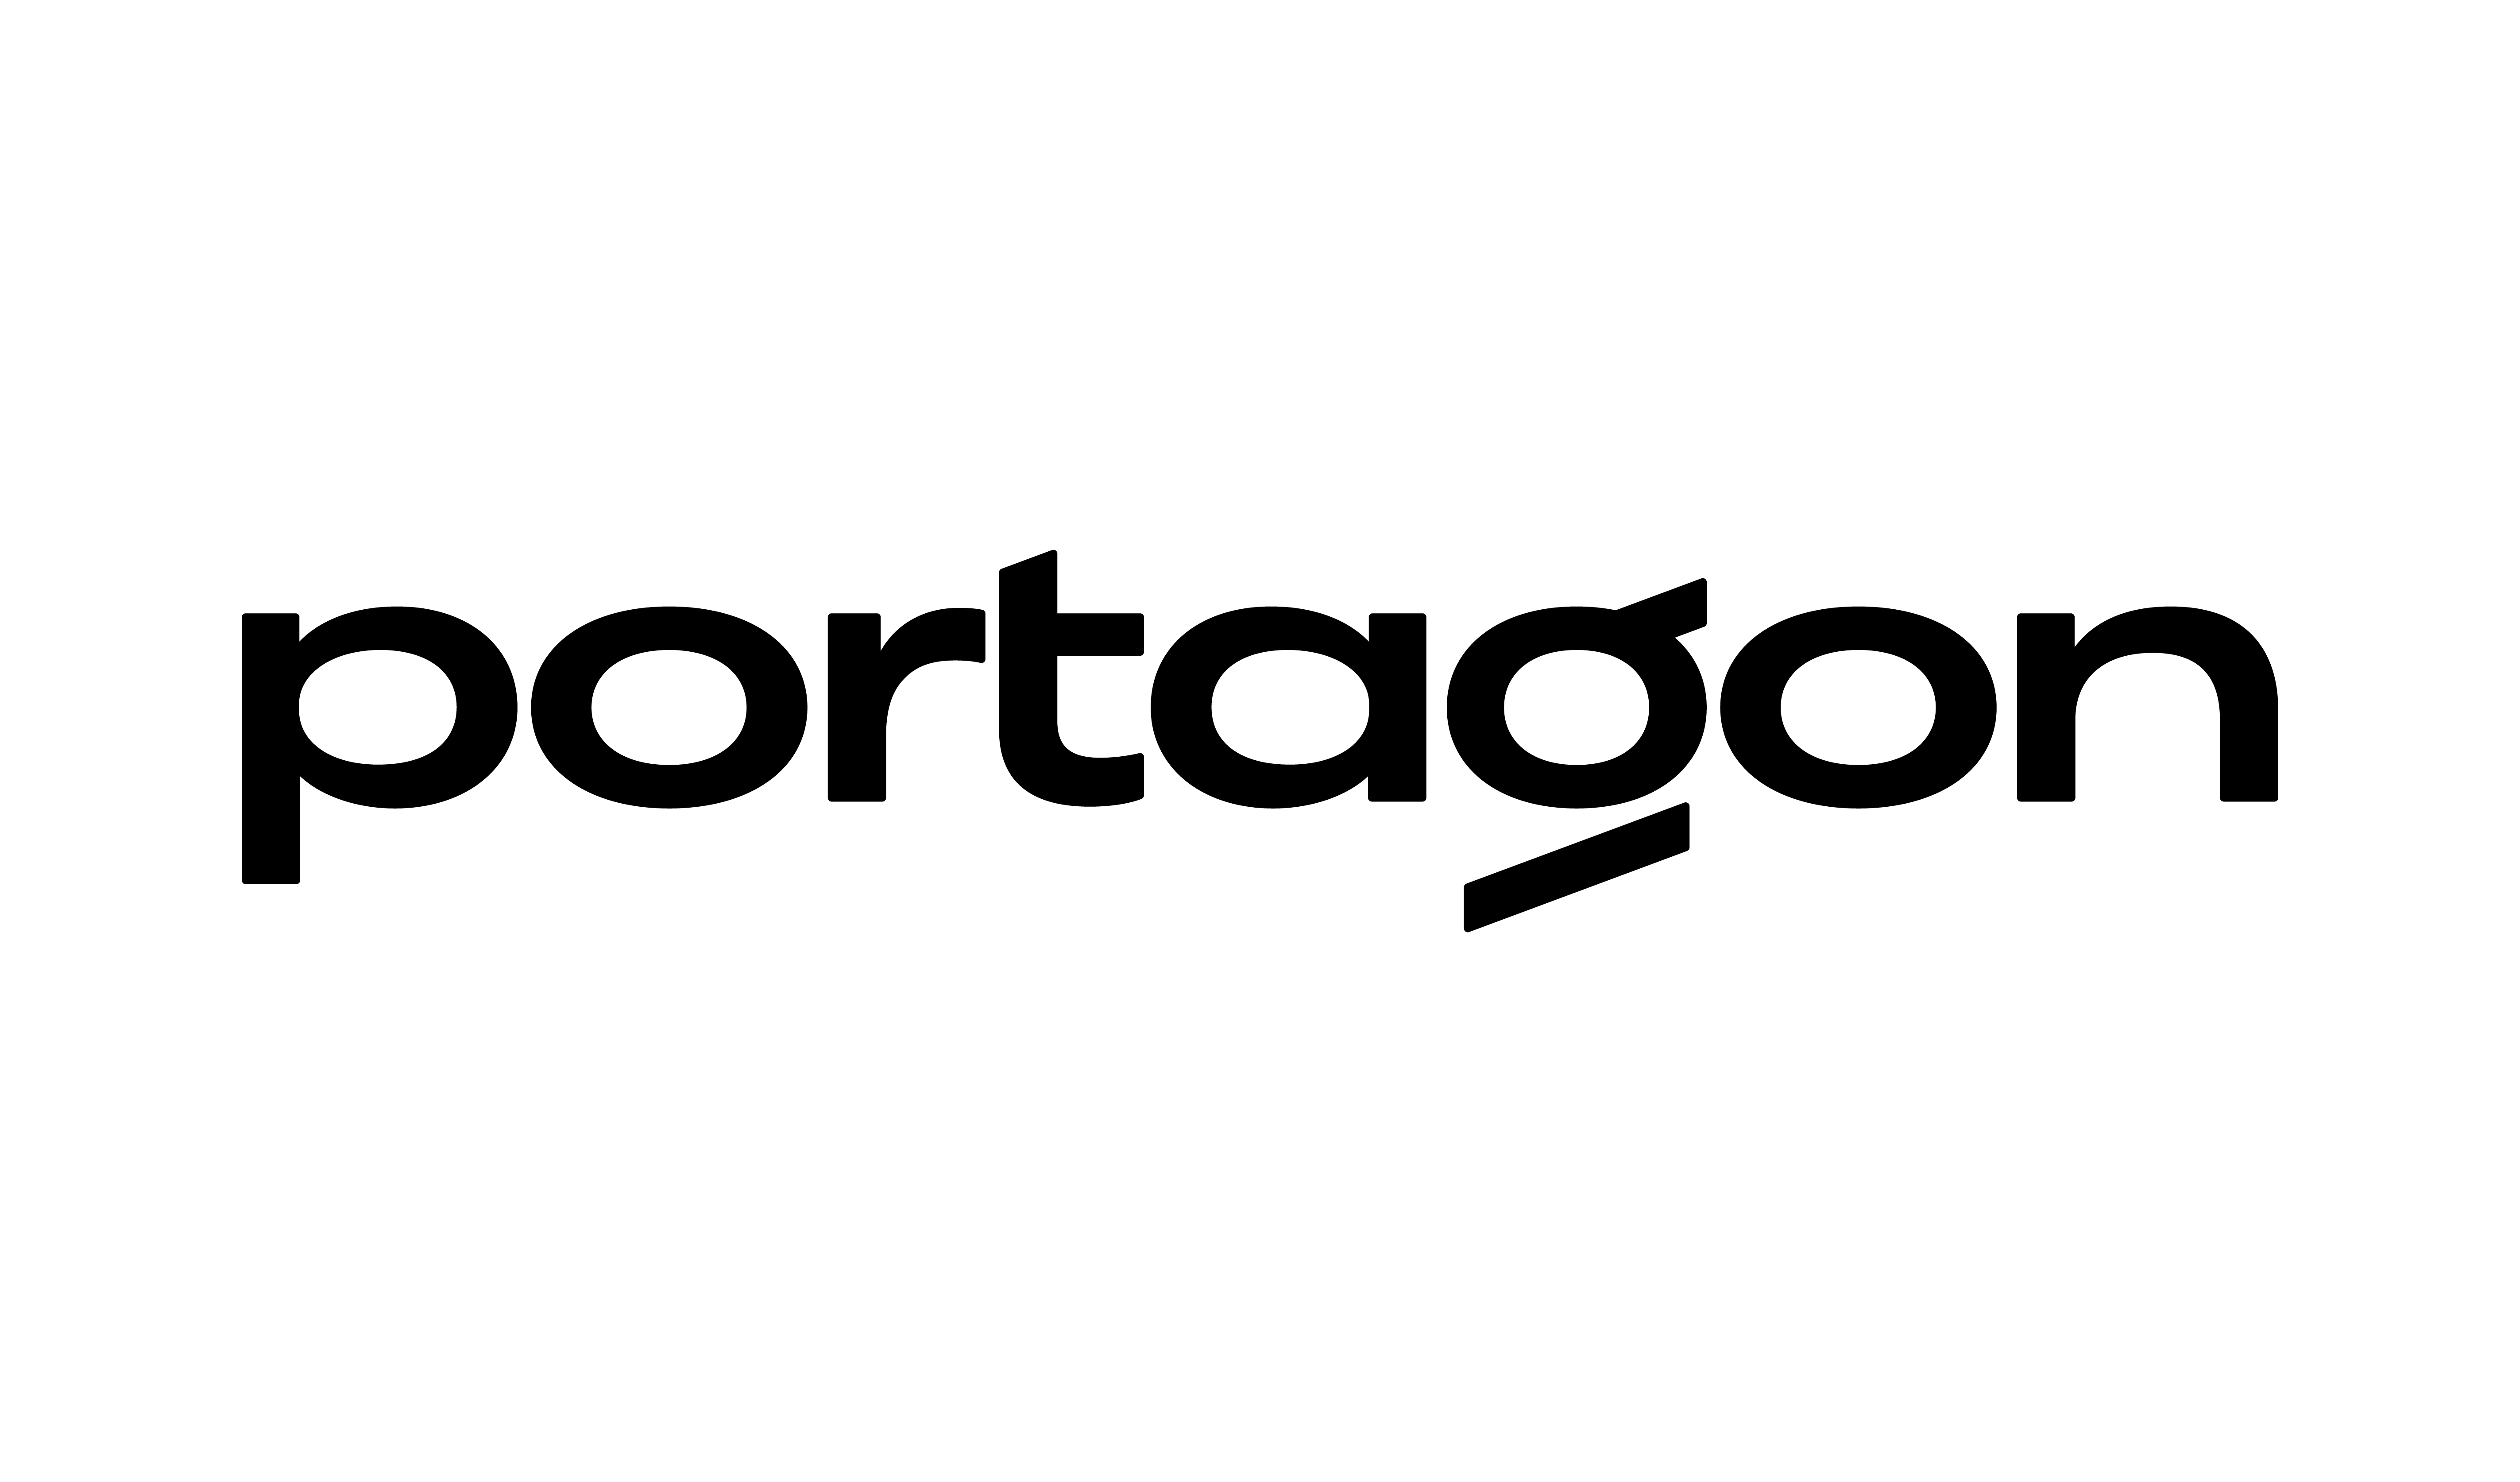 portagon